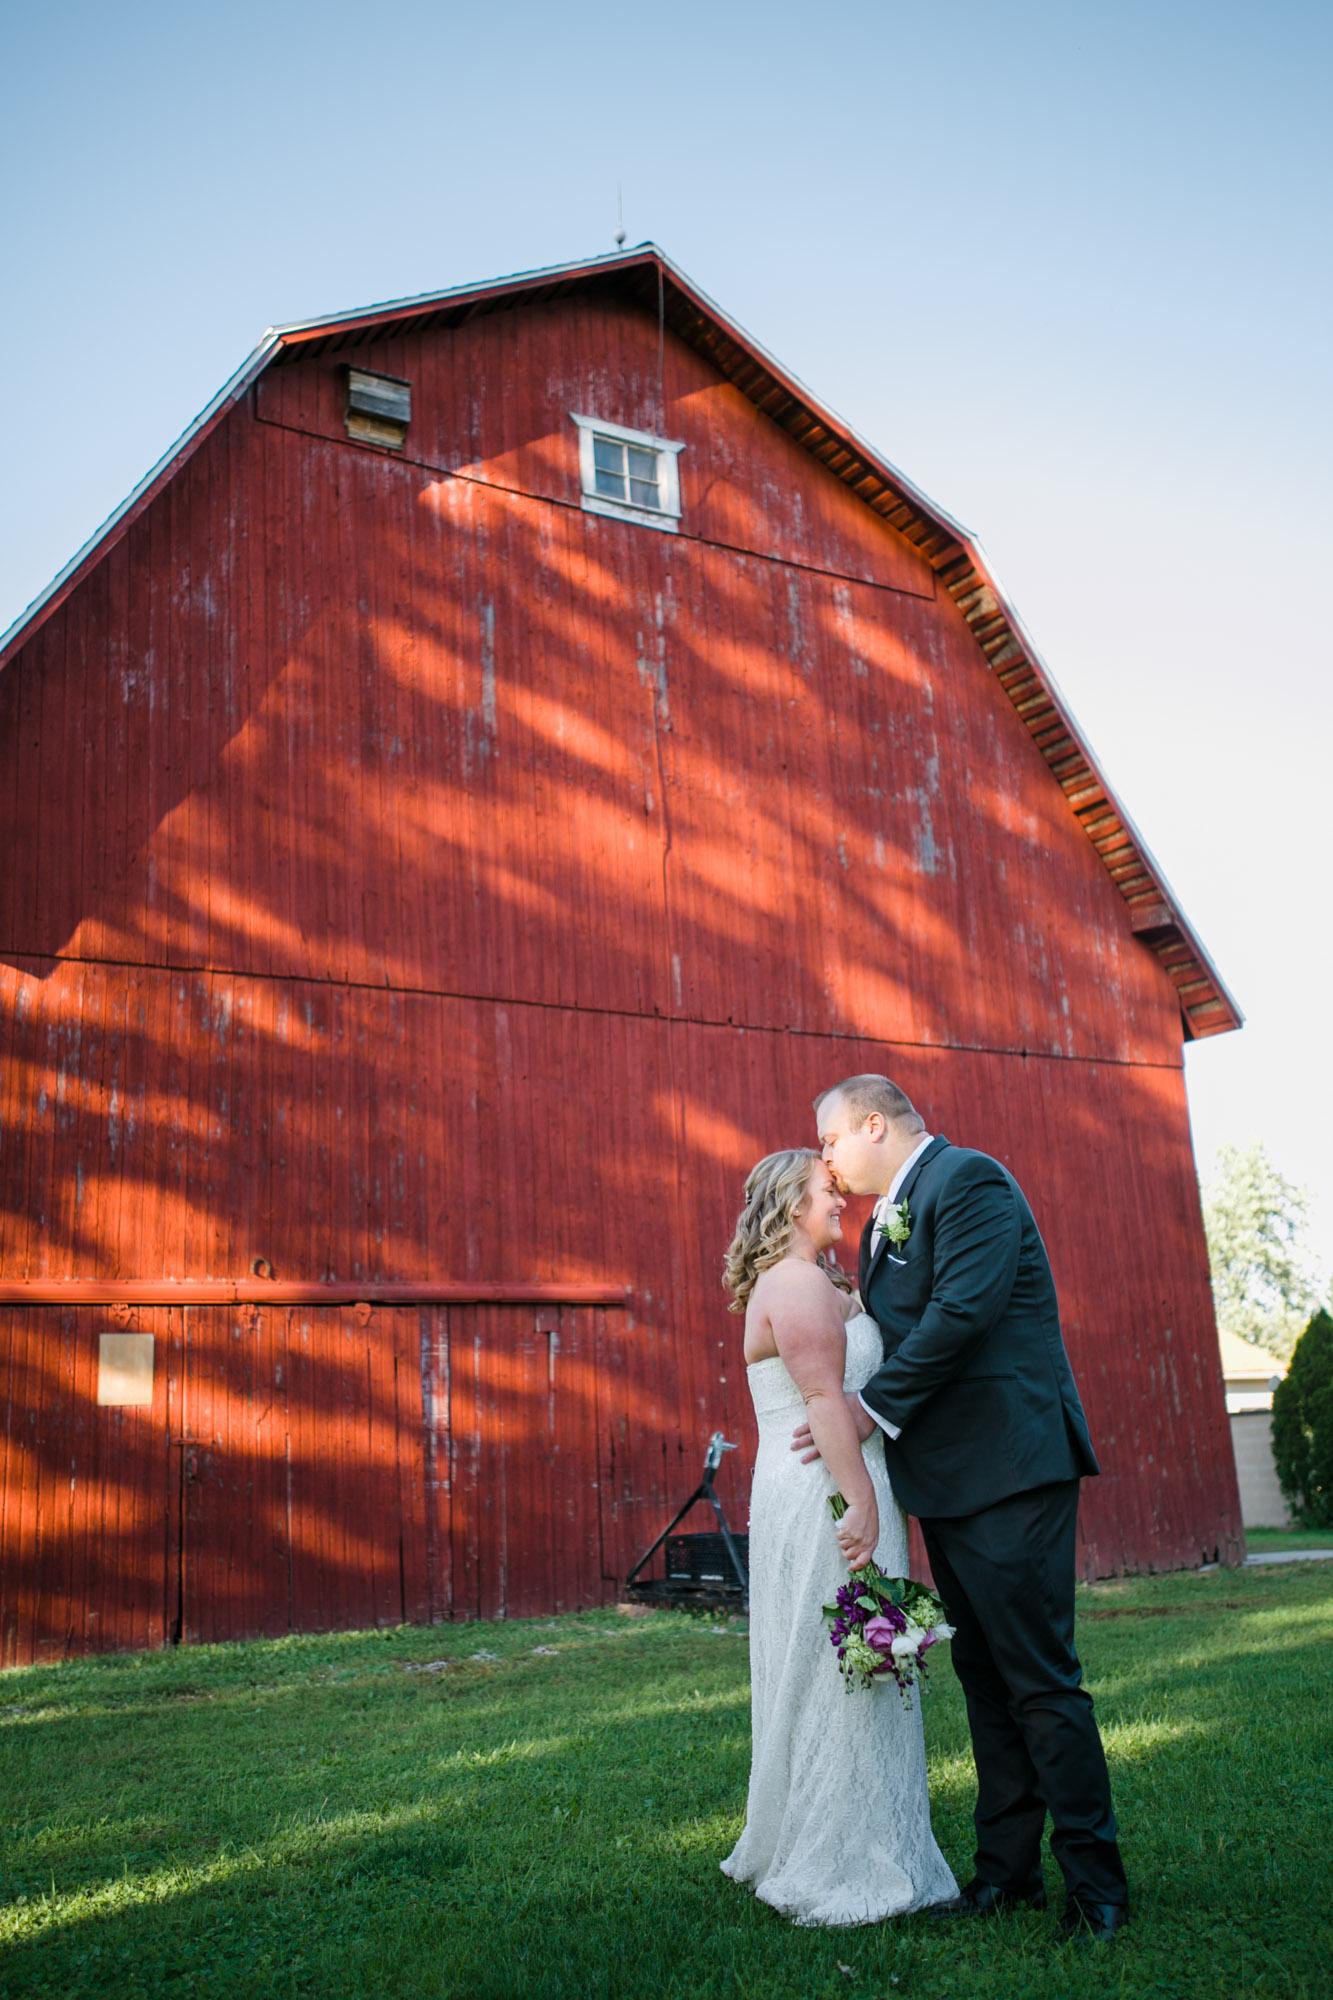 hilton-garden-inn-perrysburg-wedding-33.jpg